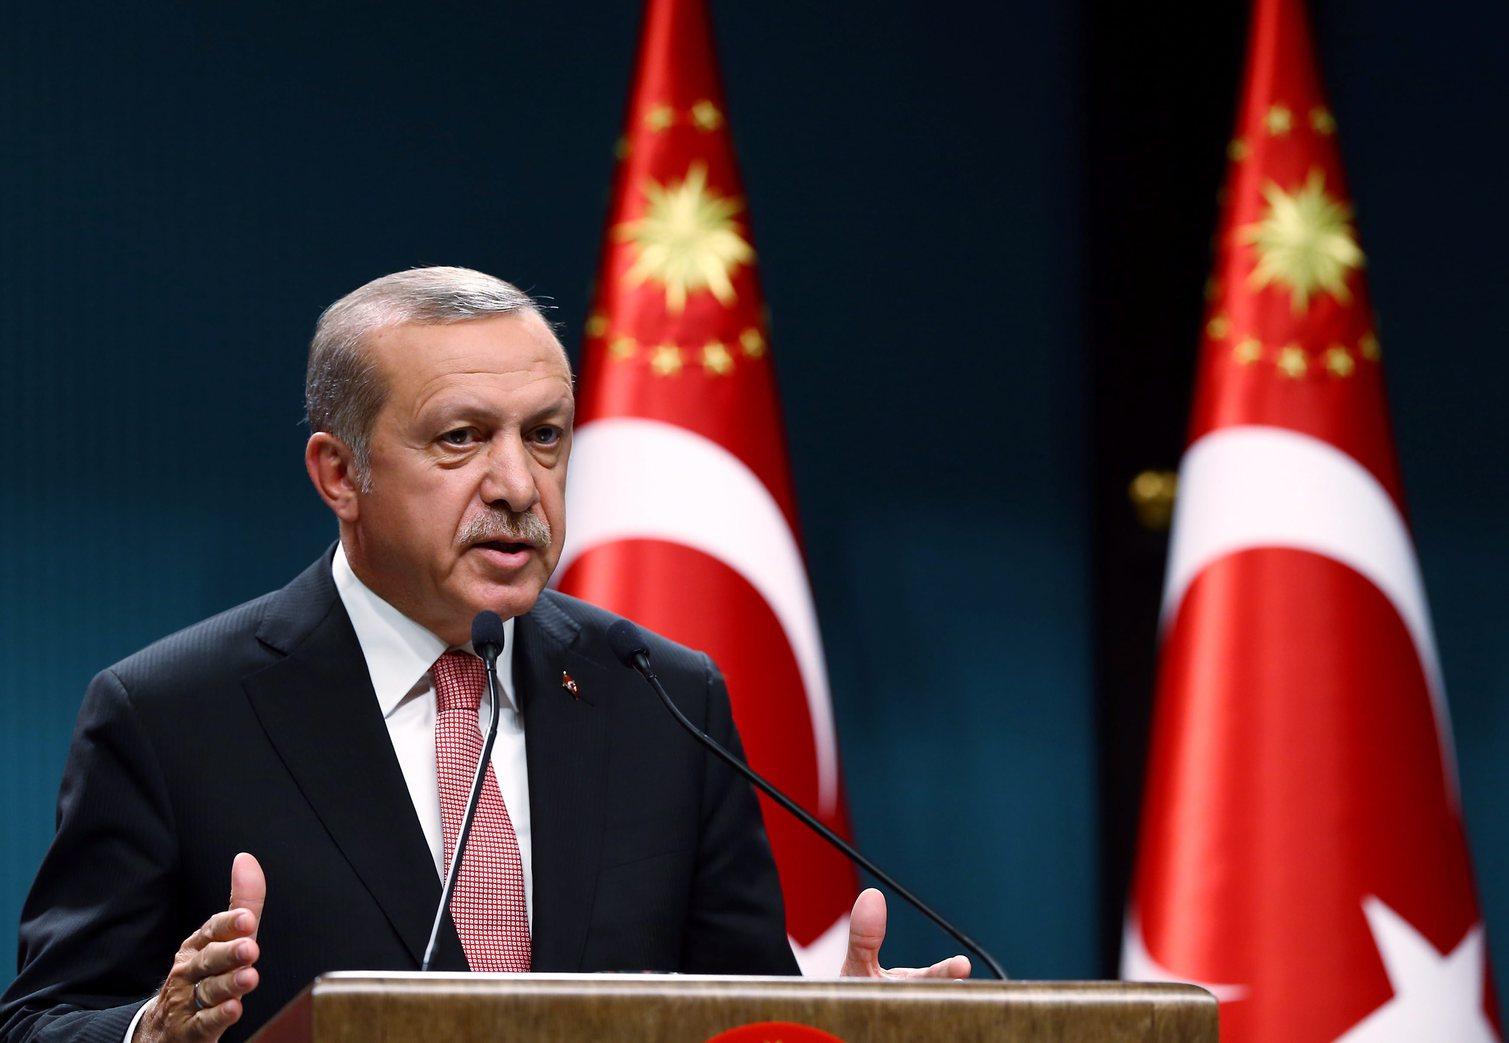 Recep Tayyip Erdogan török elnök. MTI/EPA